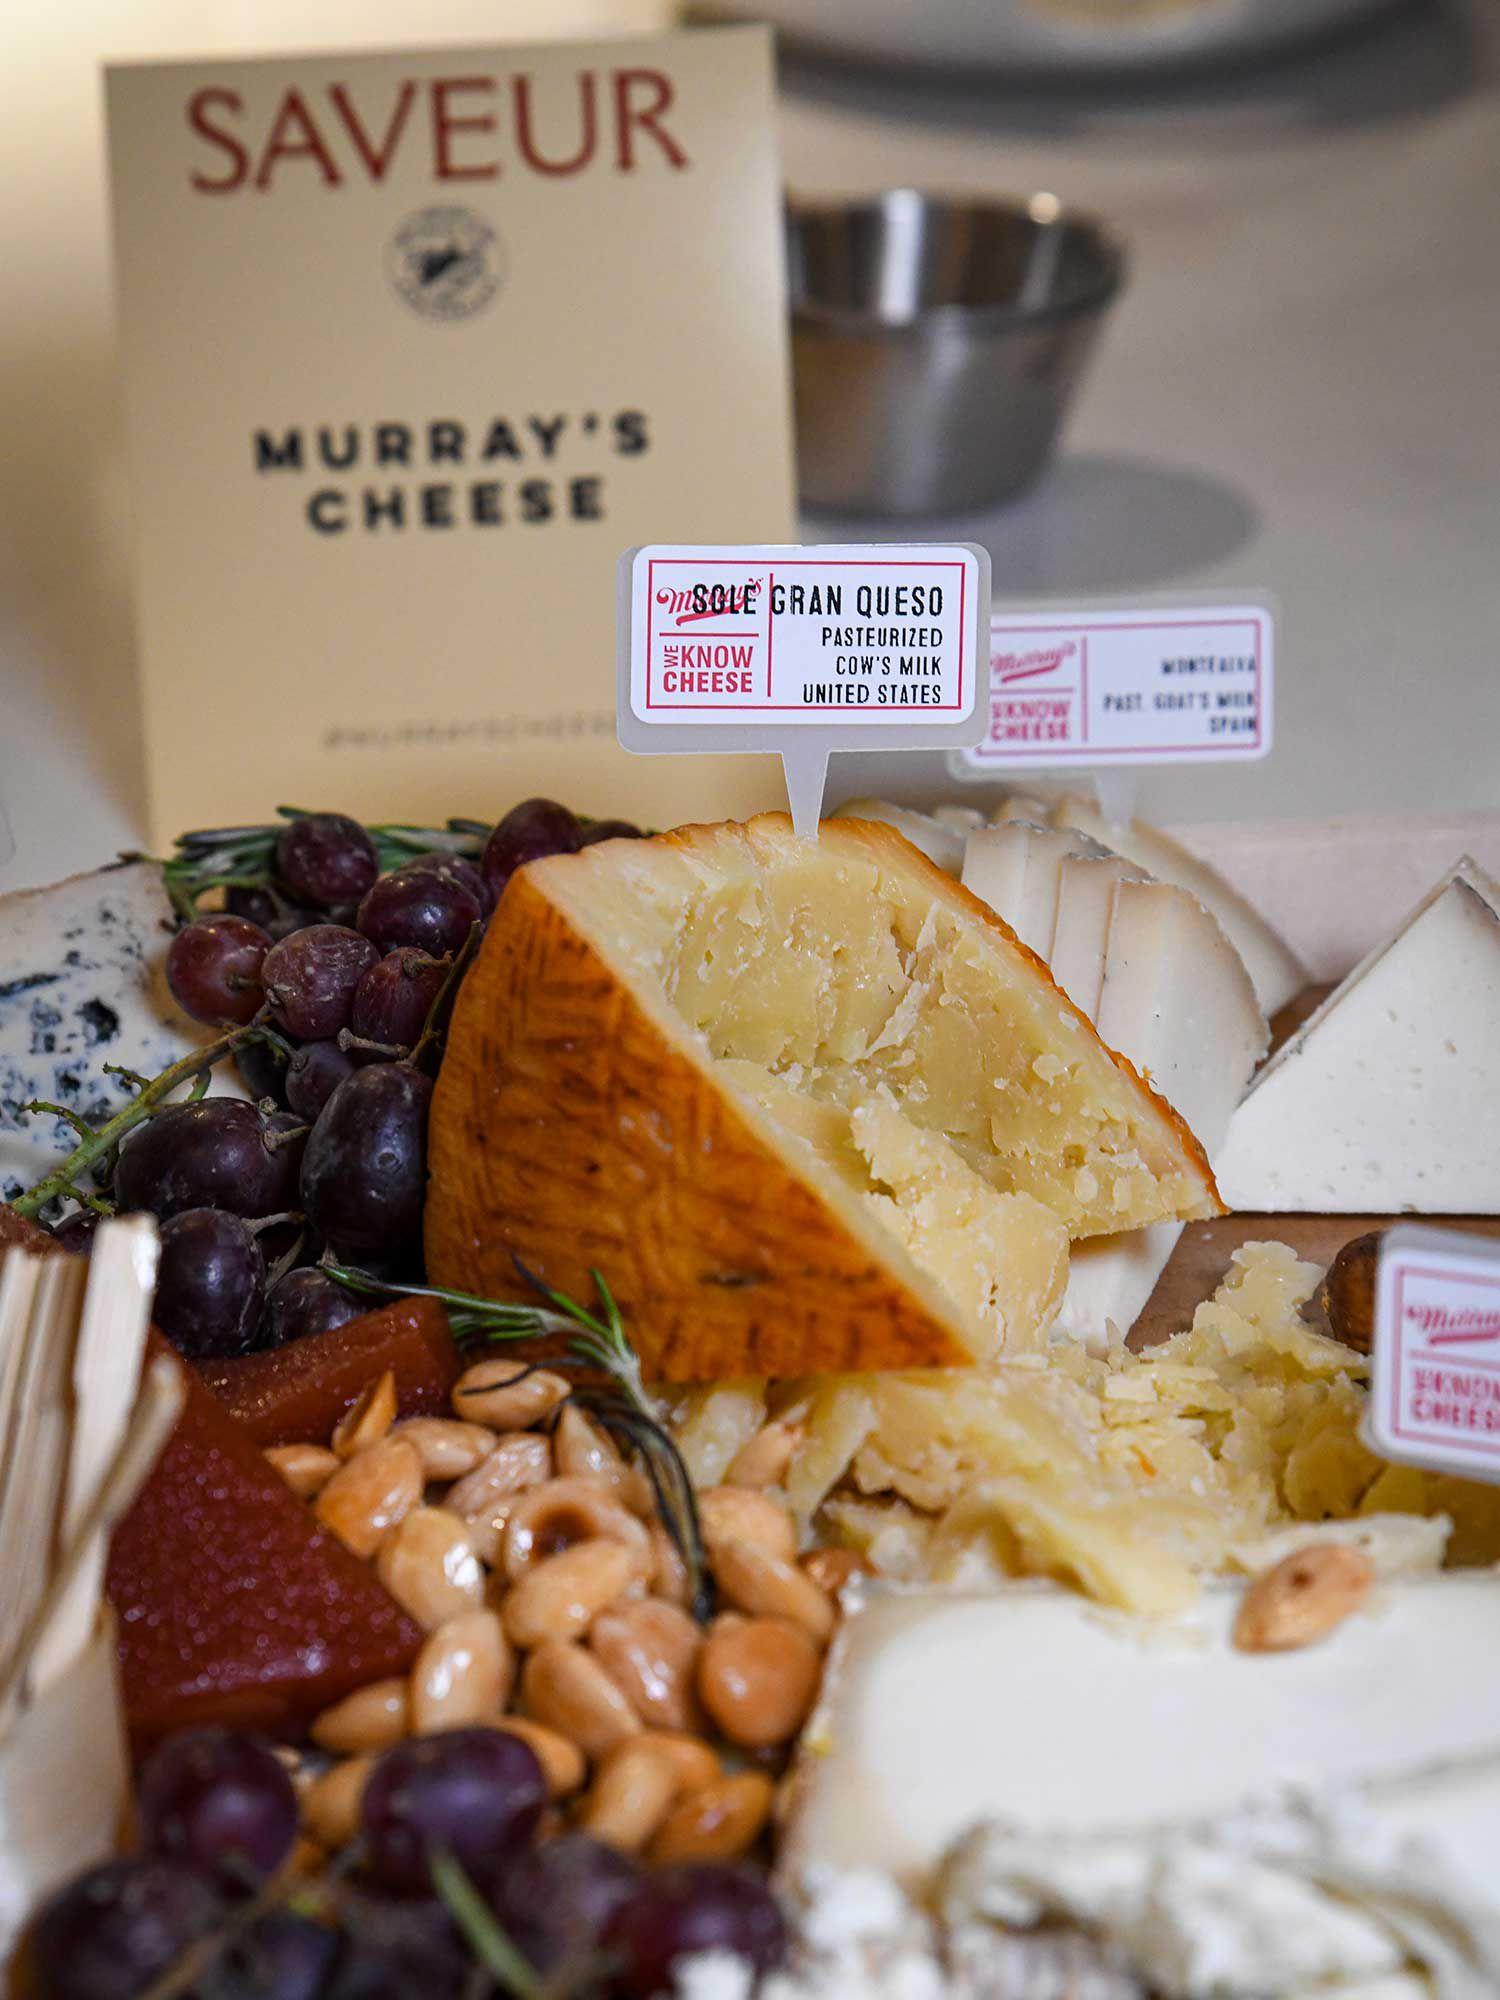 "<a href=""https://www.murrayscheese.com/?gclid=CjwKCAiAg9rxBRADEiwAxKDTuumxrqixItBe2xURgfjPGYSxqGr9X9bFMtVI8CgtfUSFOdabDD4vzBoCaU0QAvD_BwE"">Murray's Cheese</a> supplied beautiful cheese boards for the event."